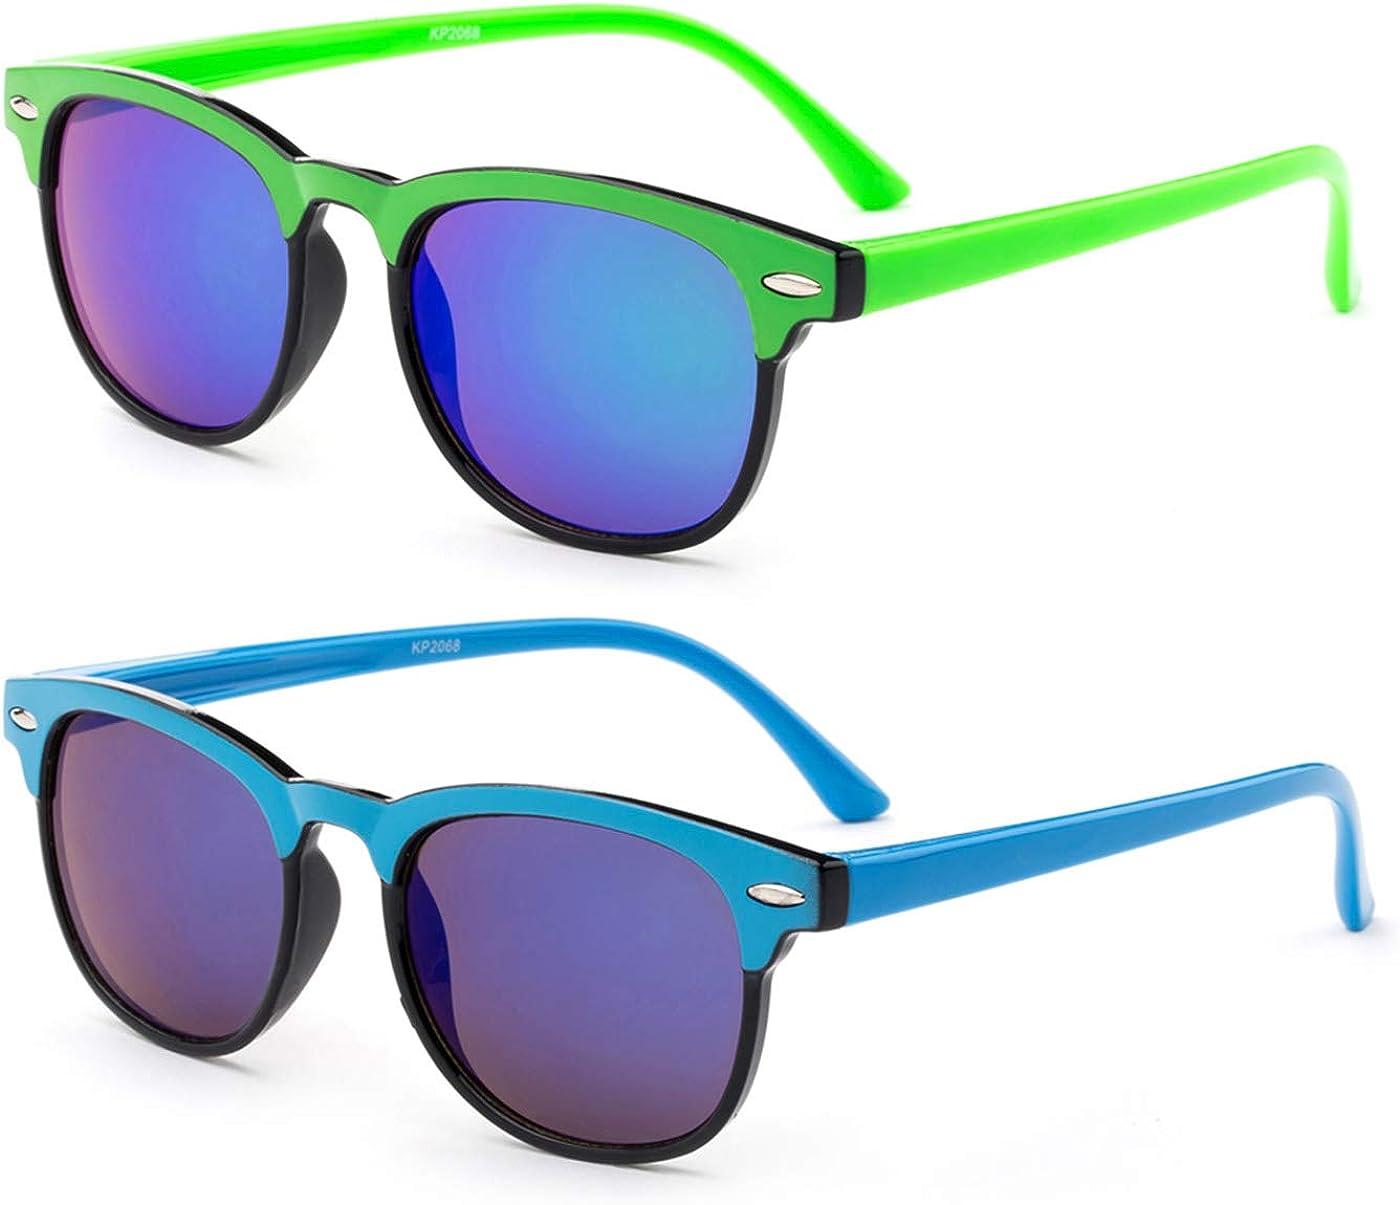 Kids Two Tone Sunglasses Flash Mirror Lens for Girls Boys UV Protection